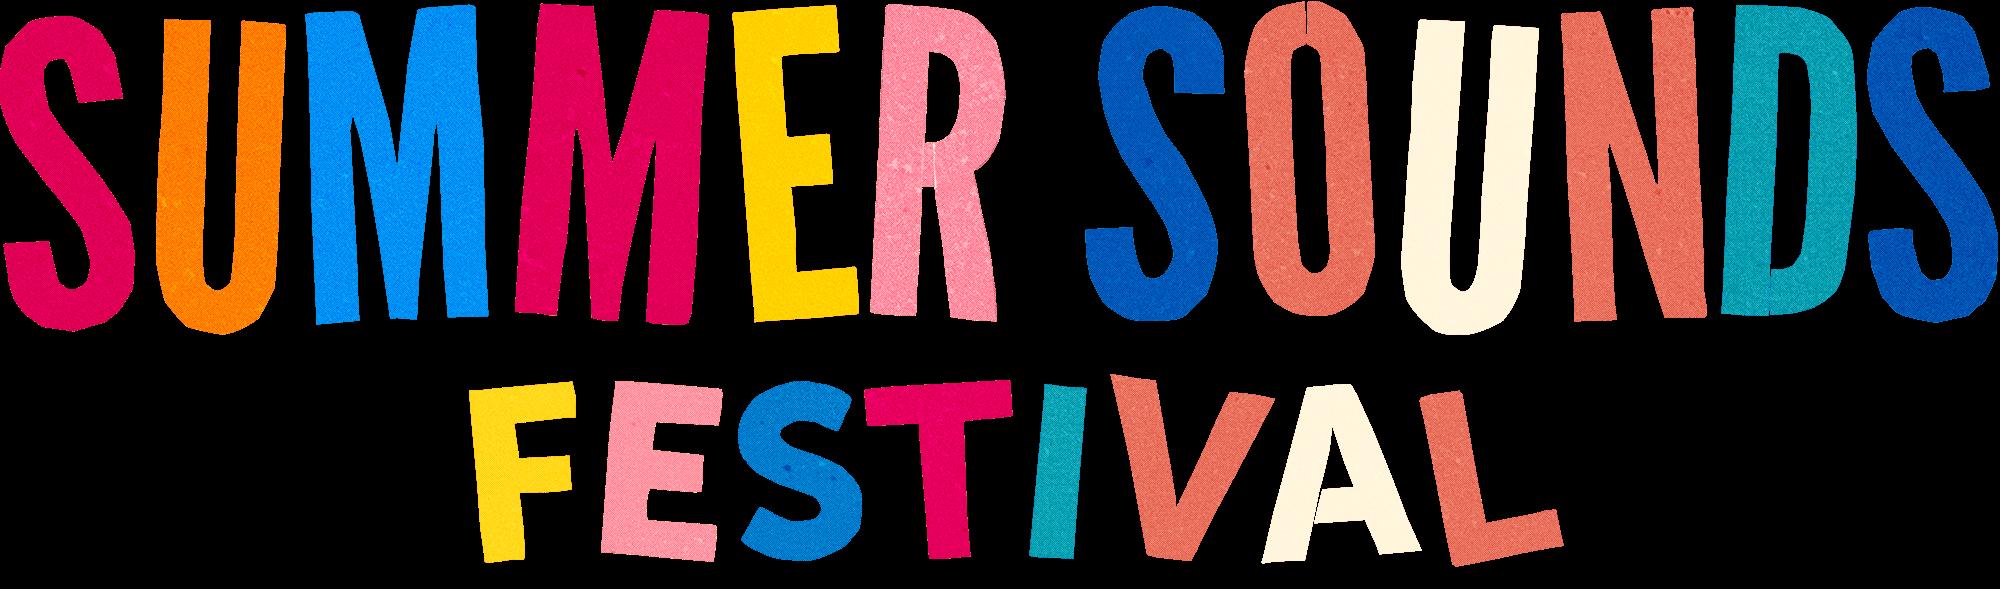 Summer Sounds Festival